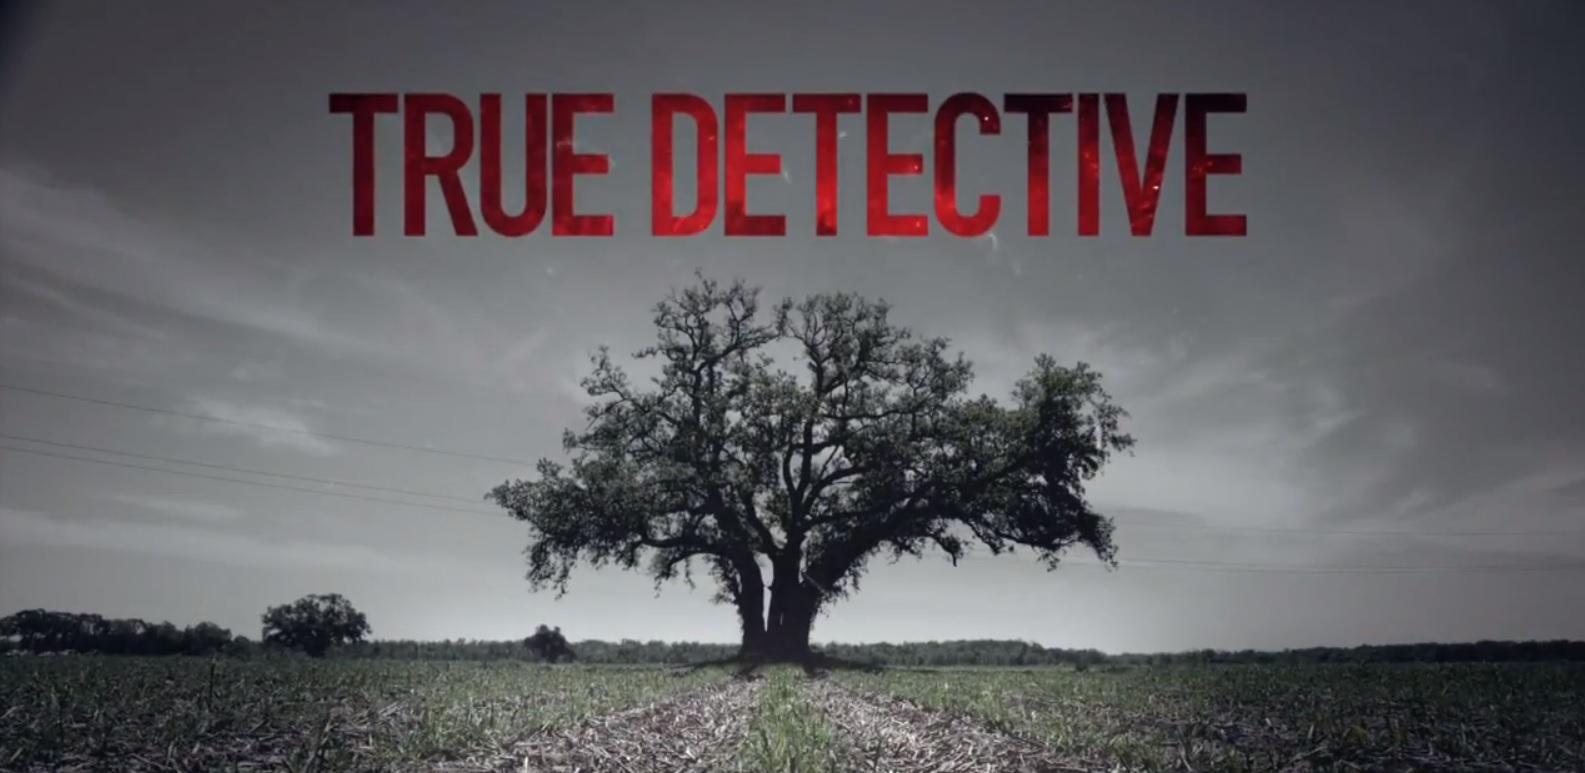 true_detective_facts_1.jpg